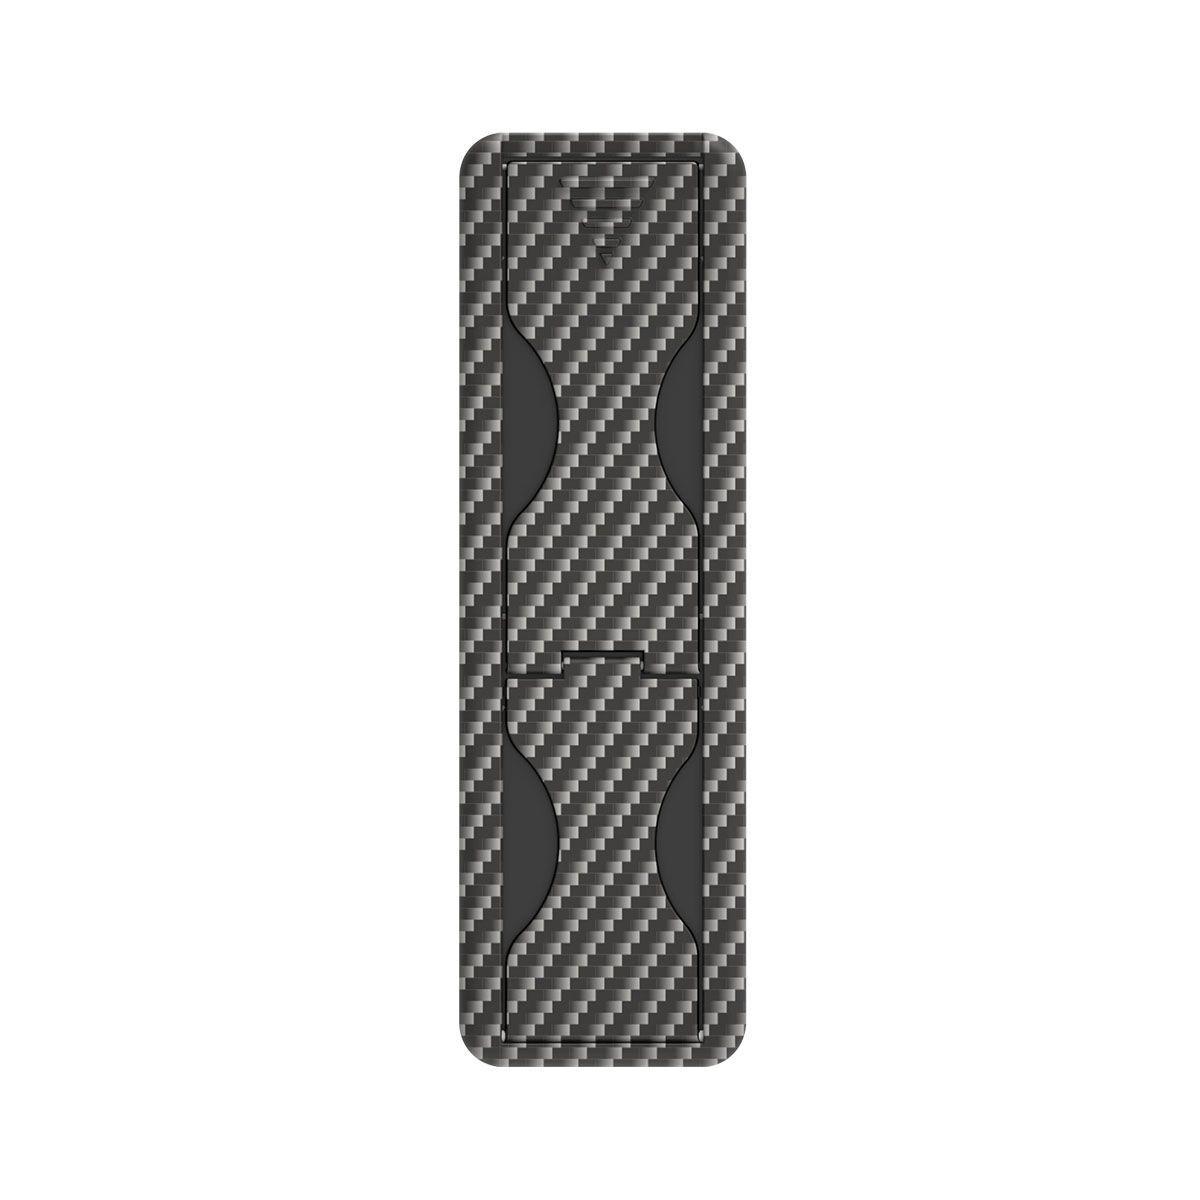 KikStik - Smartphone Kickstand - Carbon Fiber